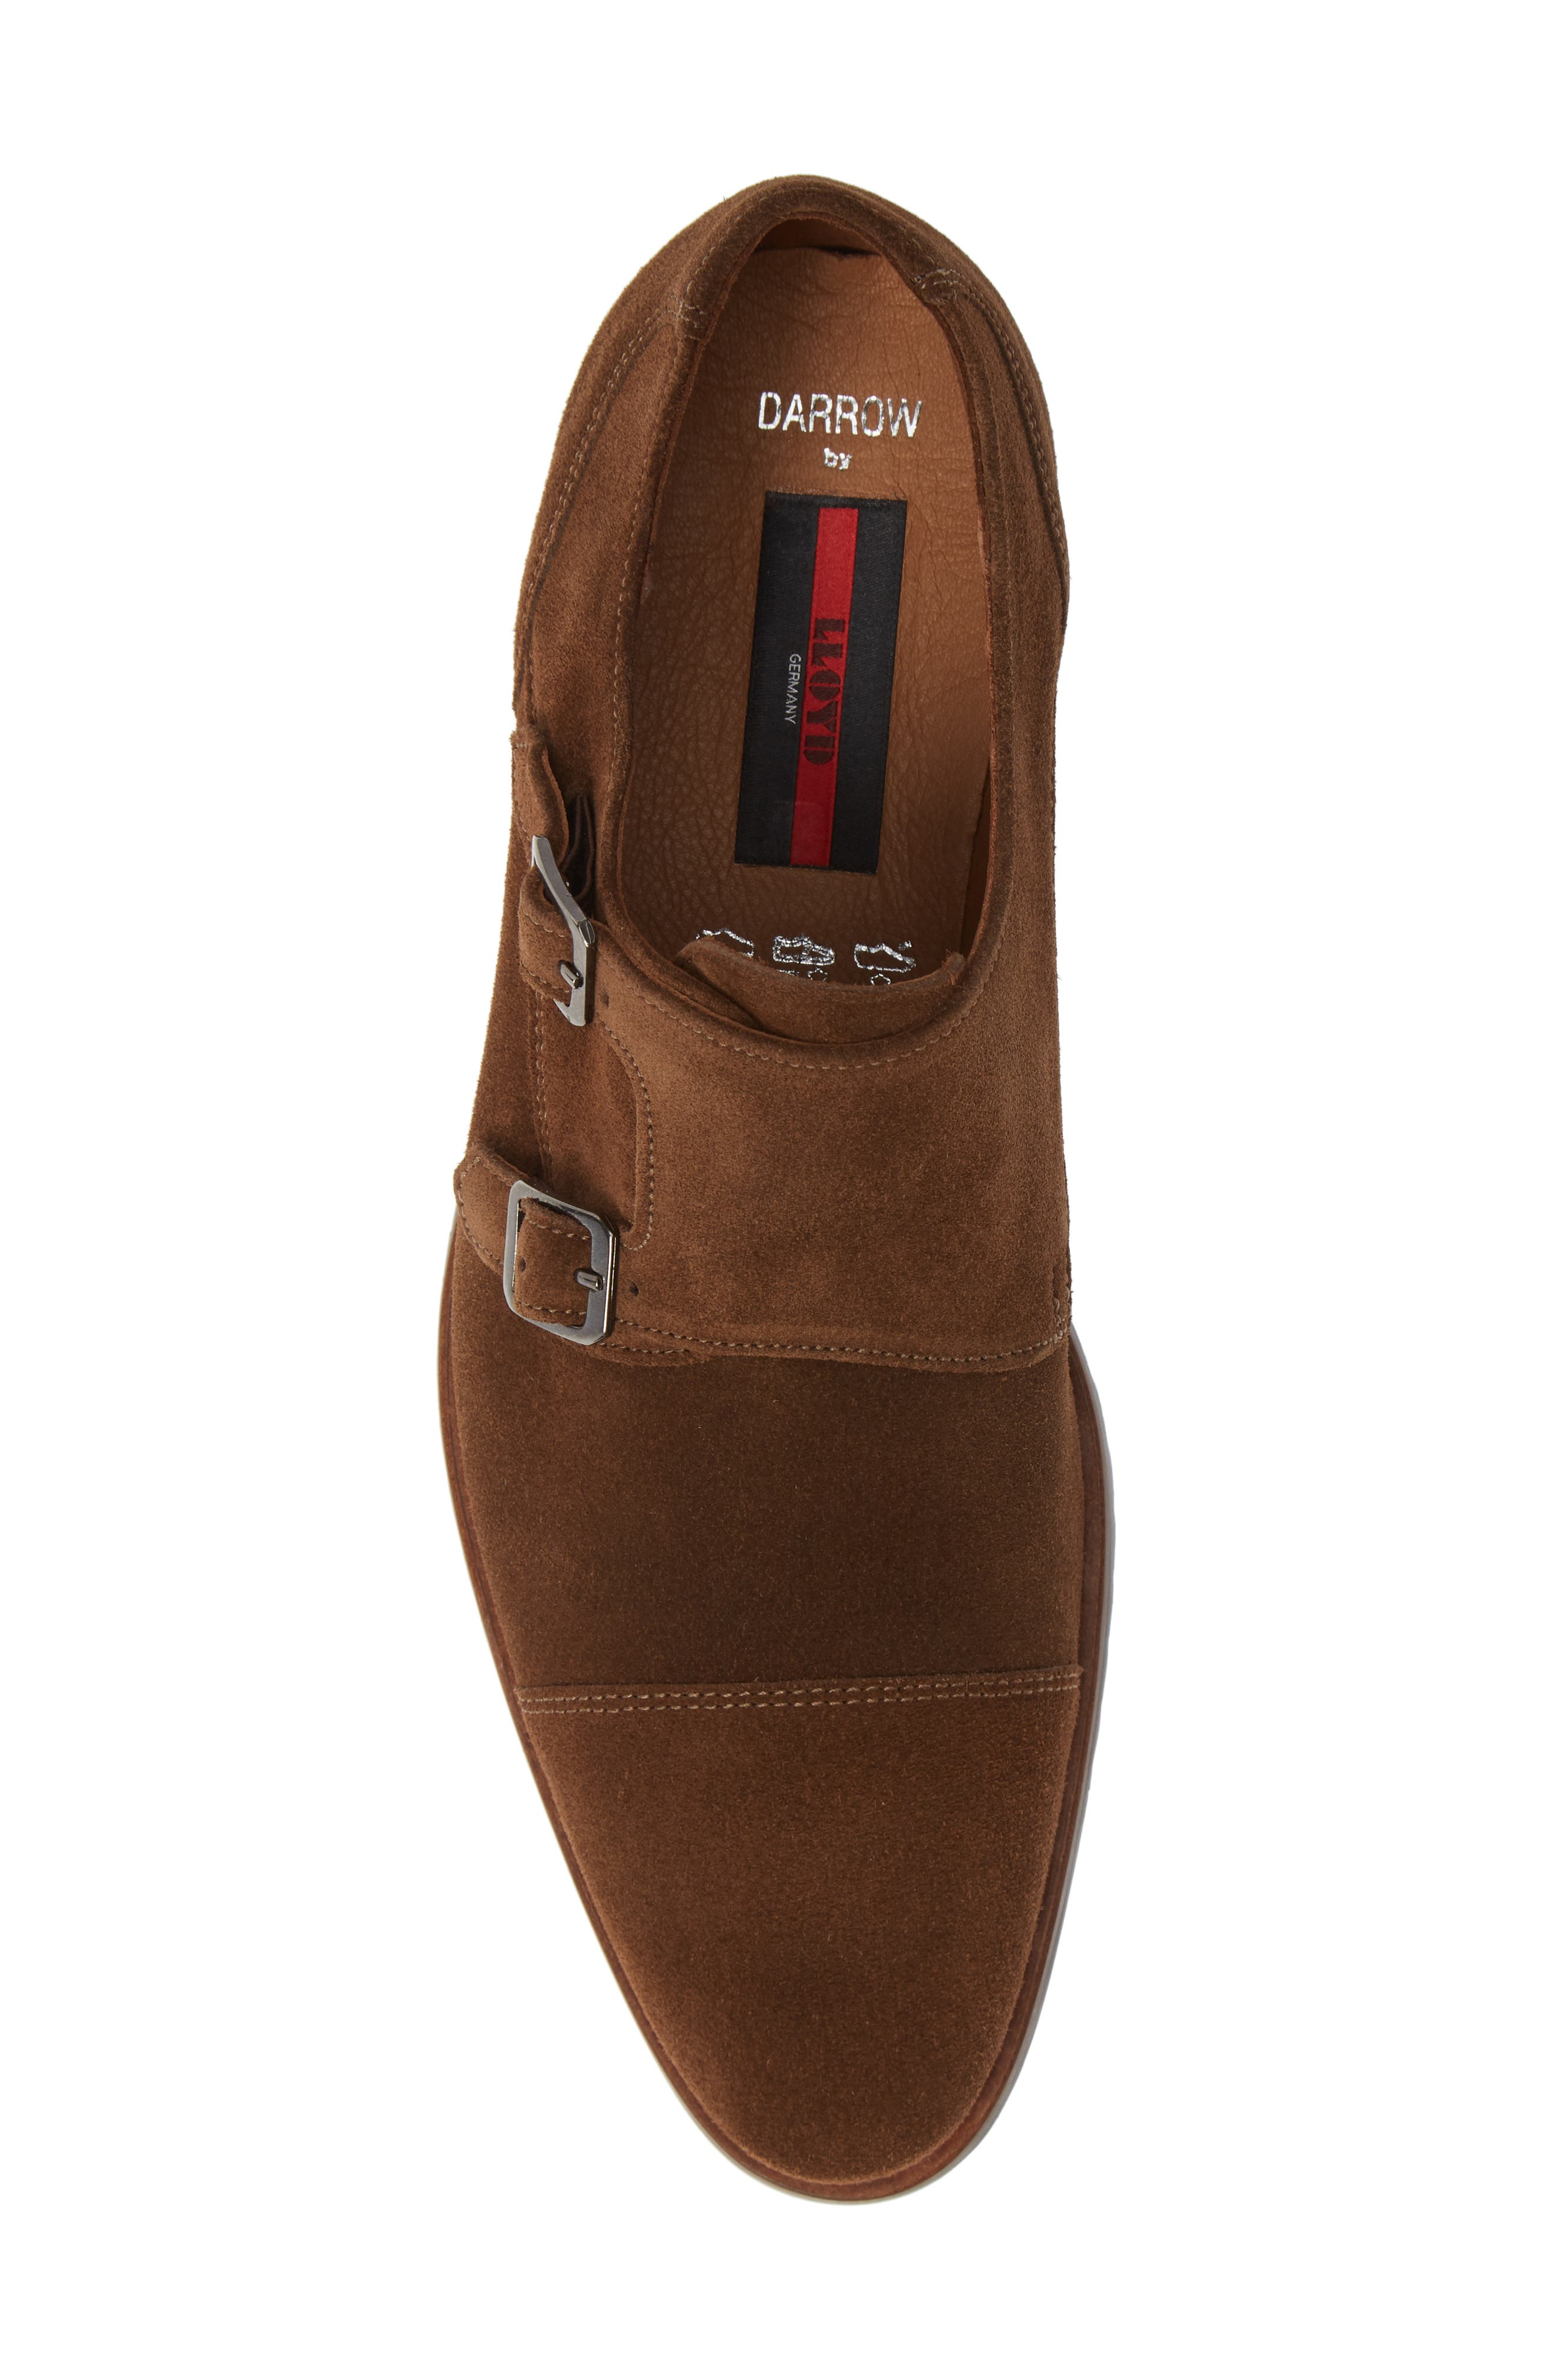 Darrow Double Monk Strap Shoe,                             Alternate thumbnail 5, color,                             CIGAR BROWN SUEDE